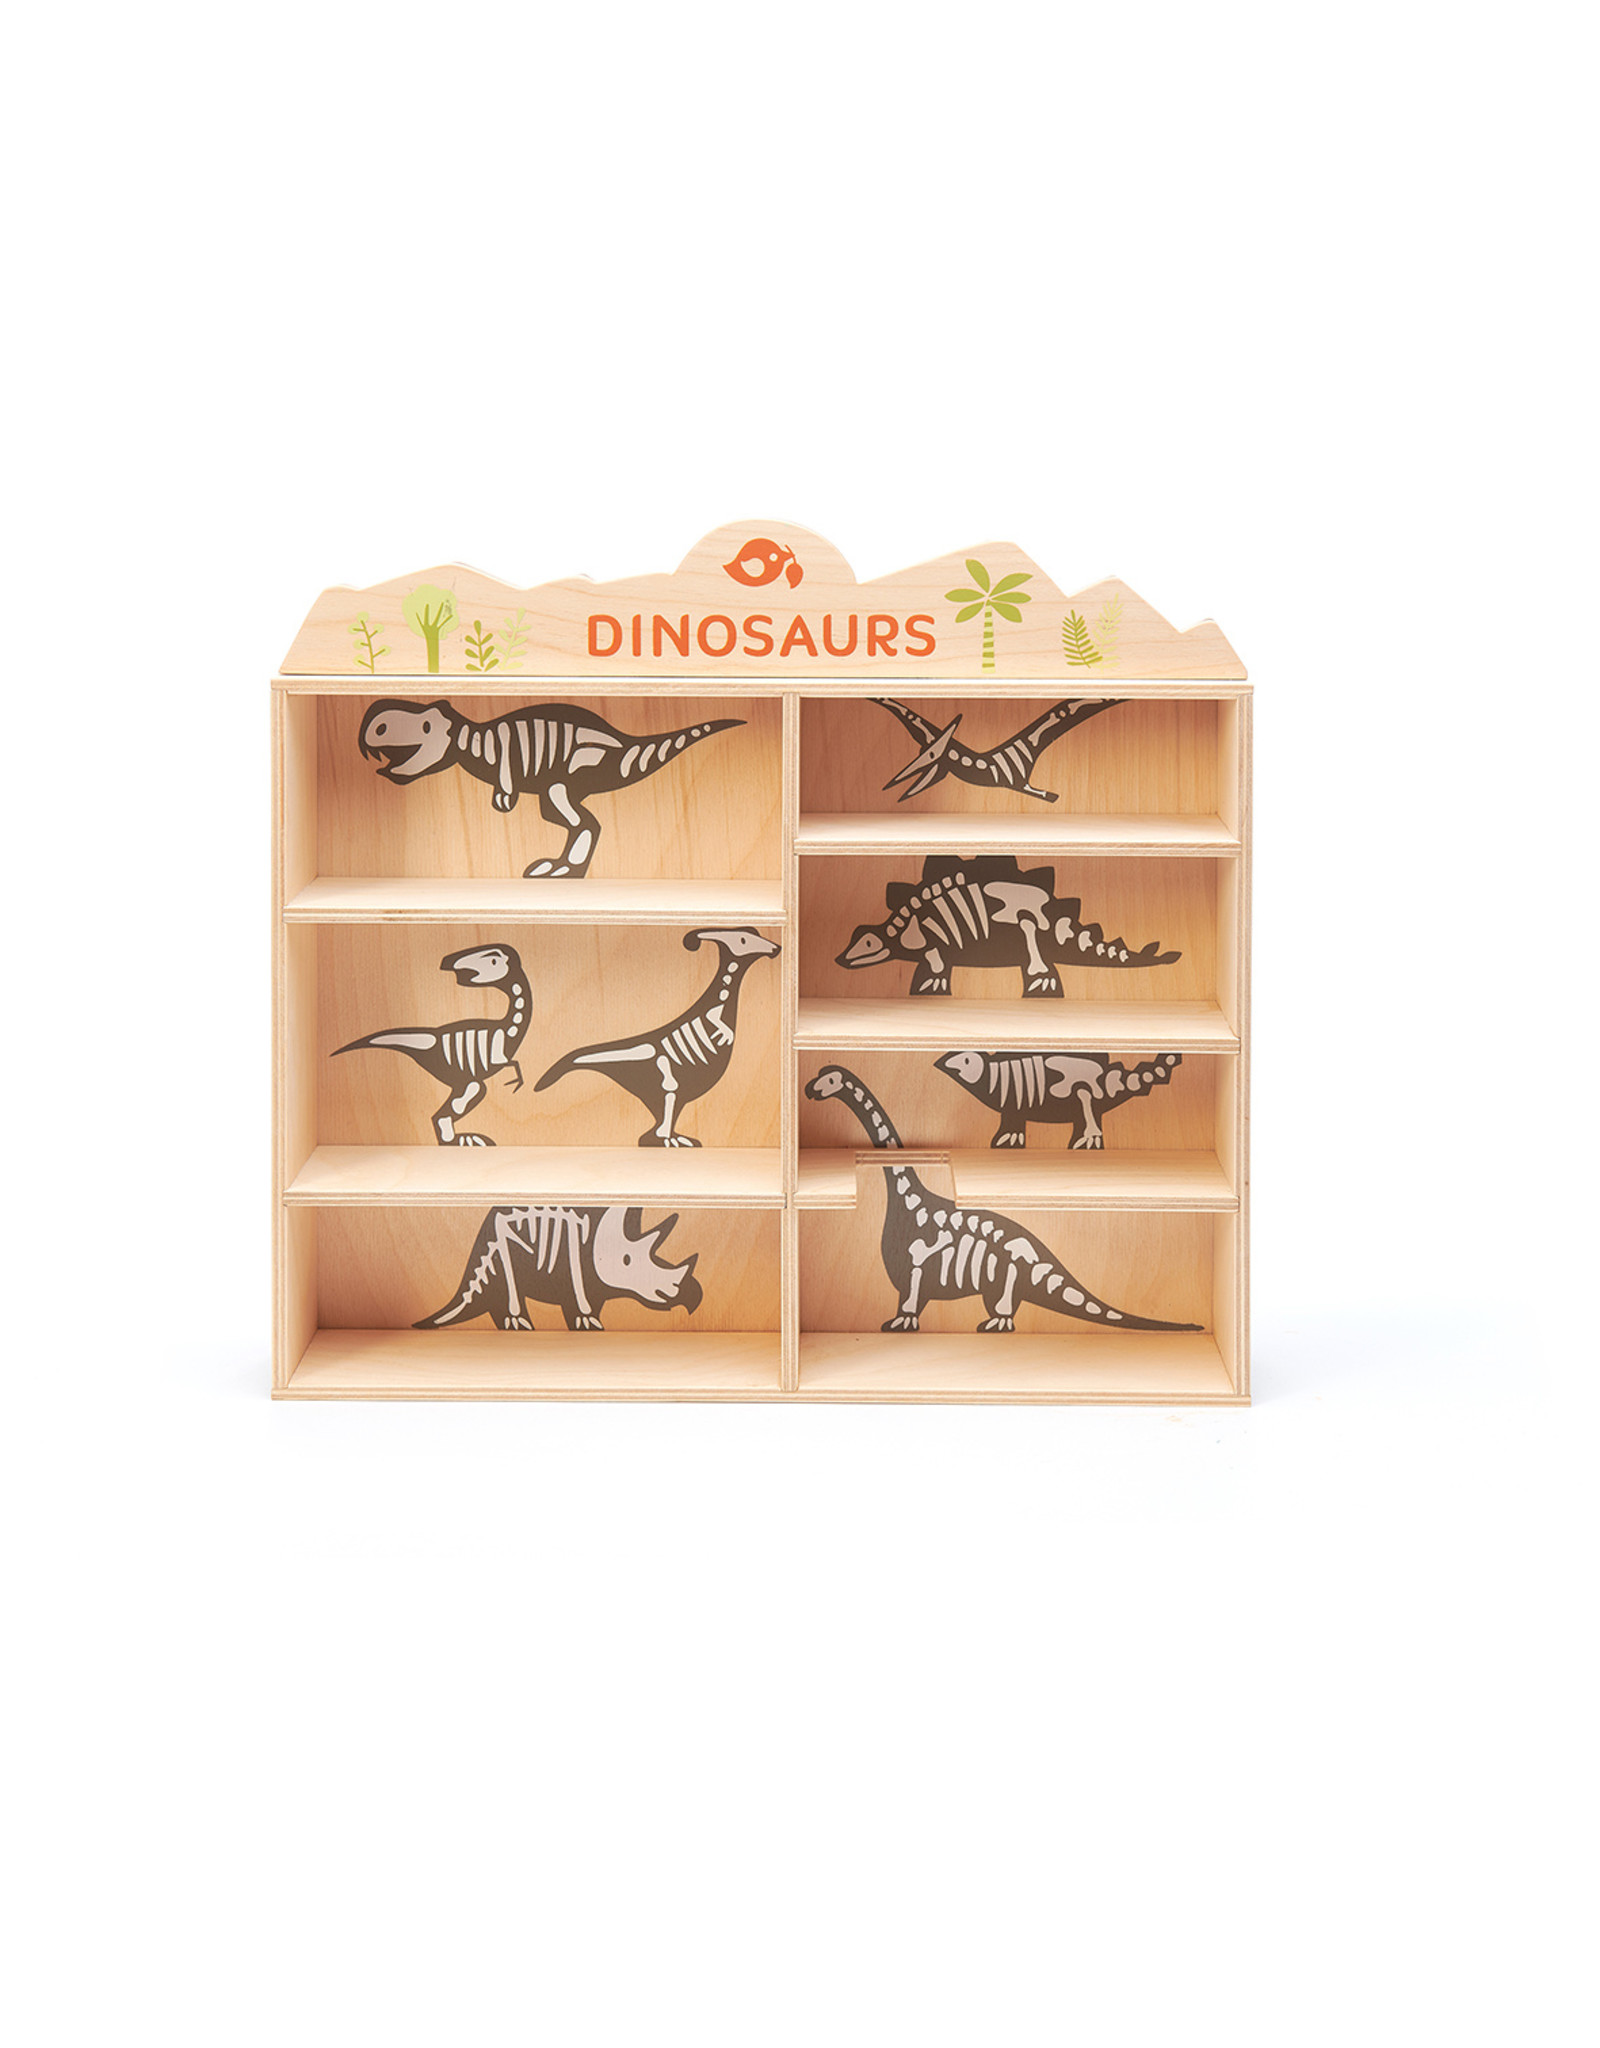 Tender Leaf Toys Dinosaurs - Triceratops